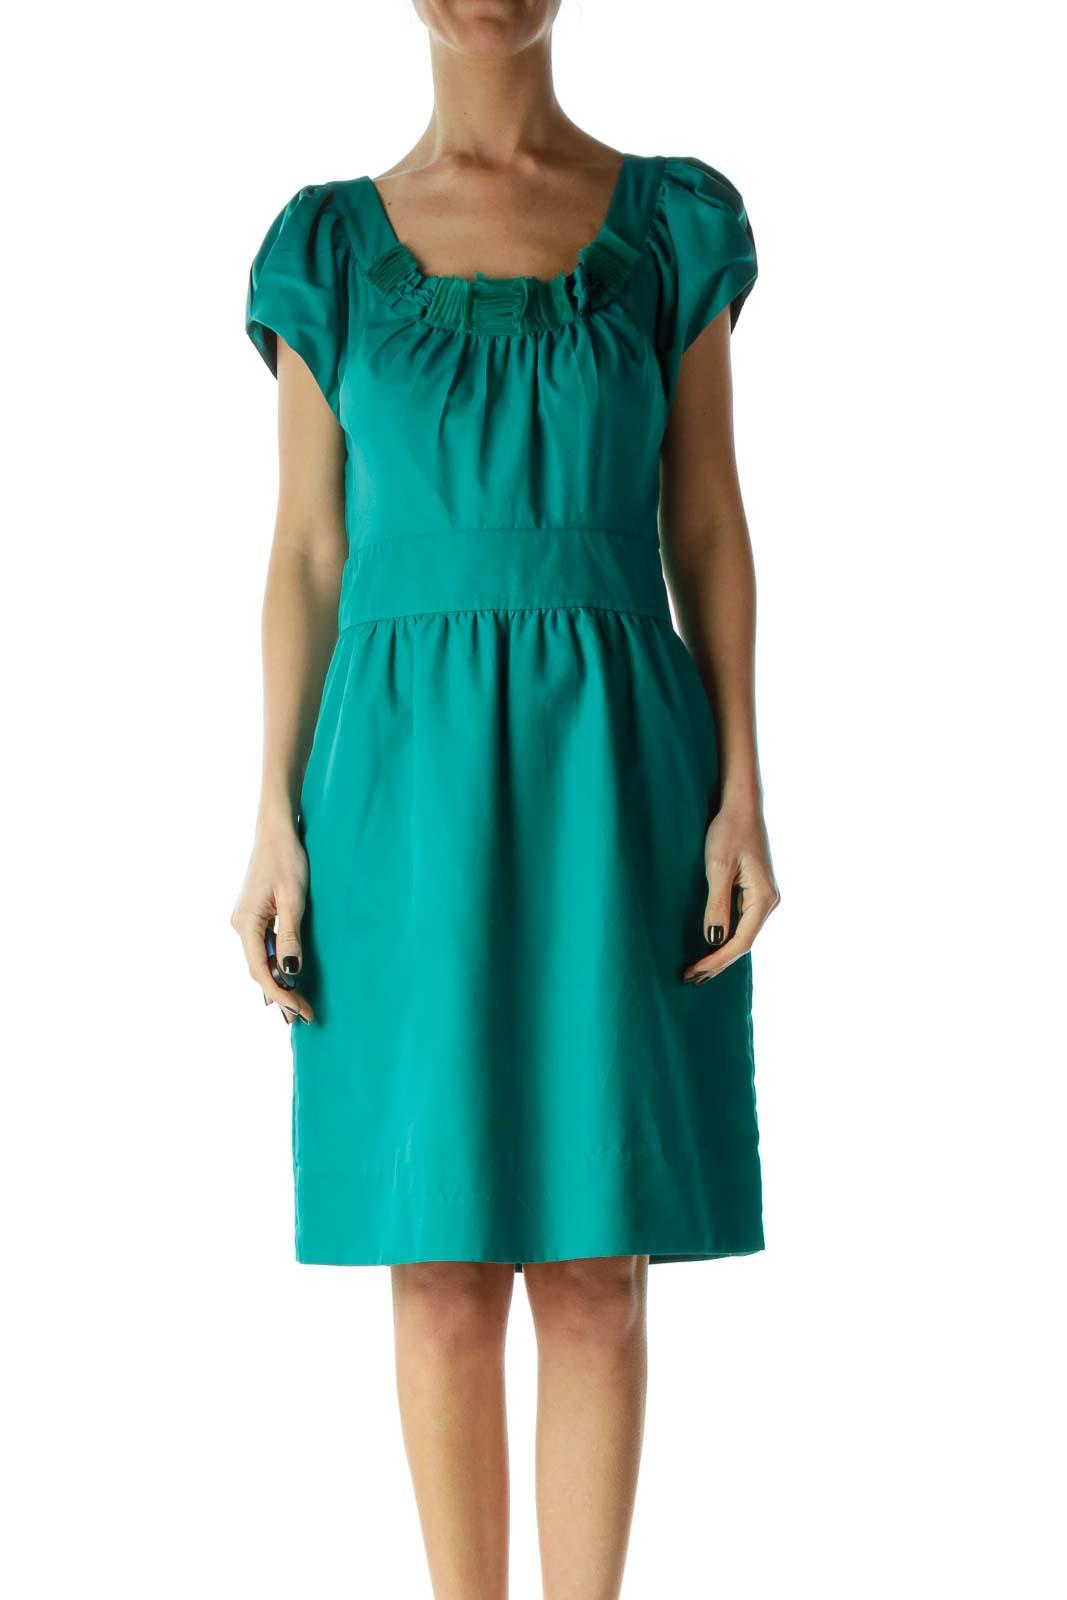 Green Round Neck Ruffled Detail Cocktail Dress